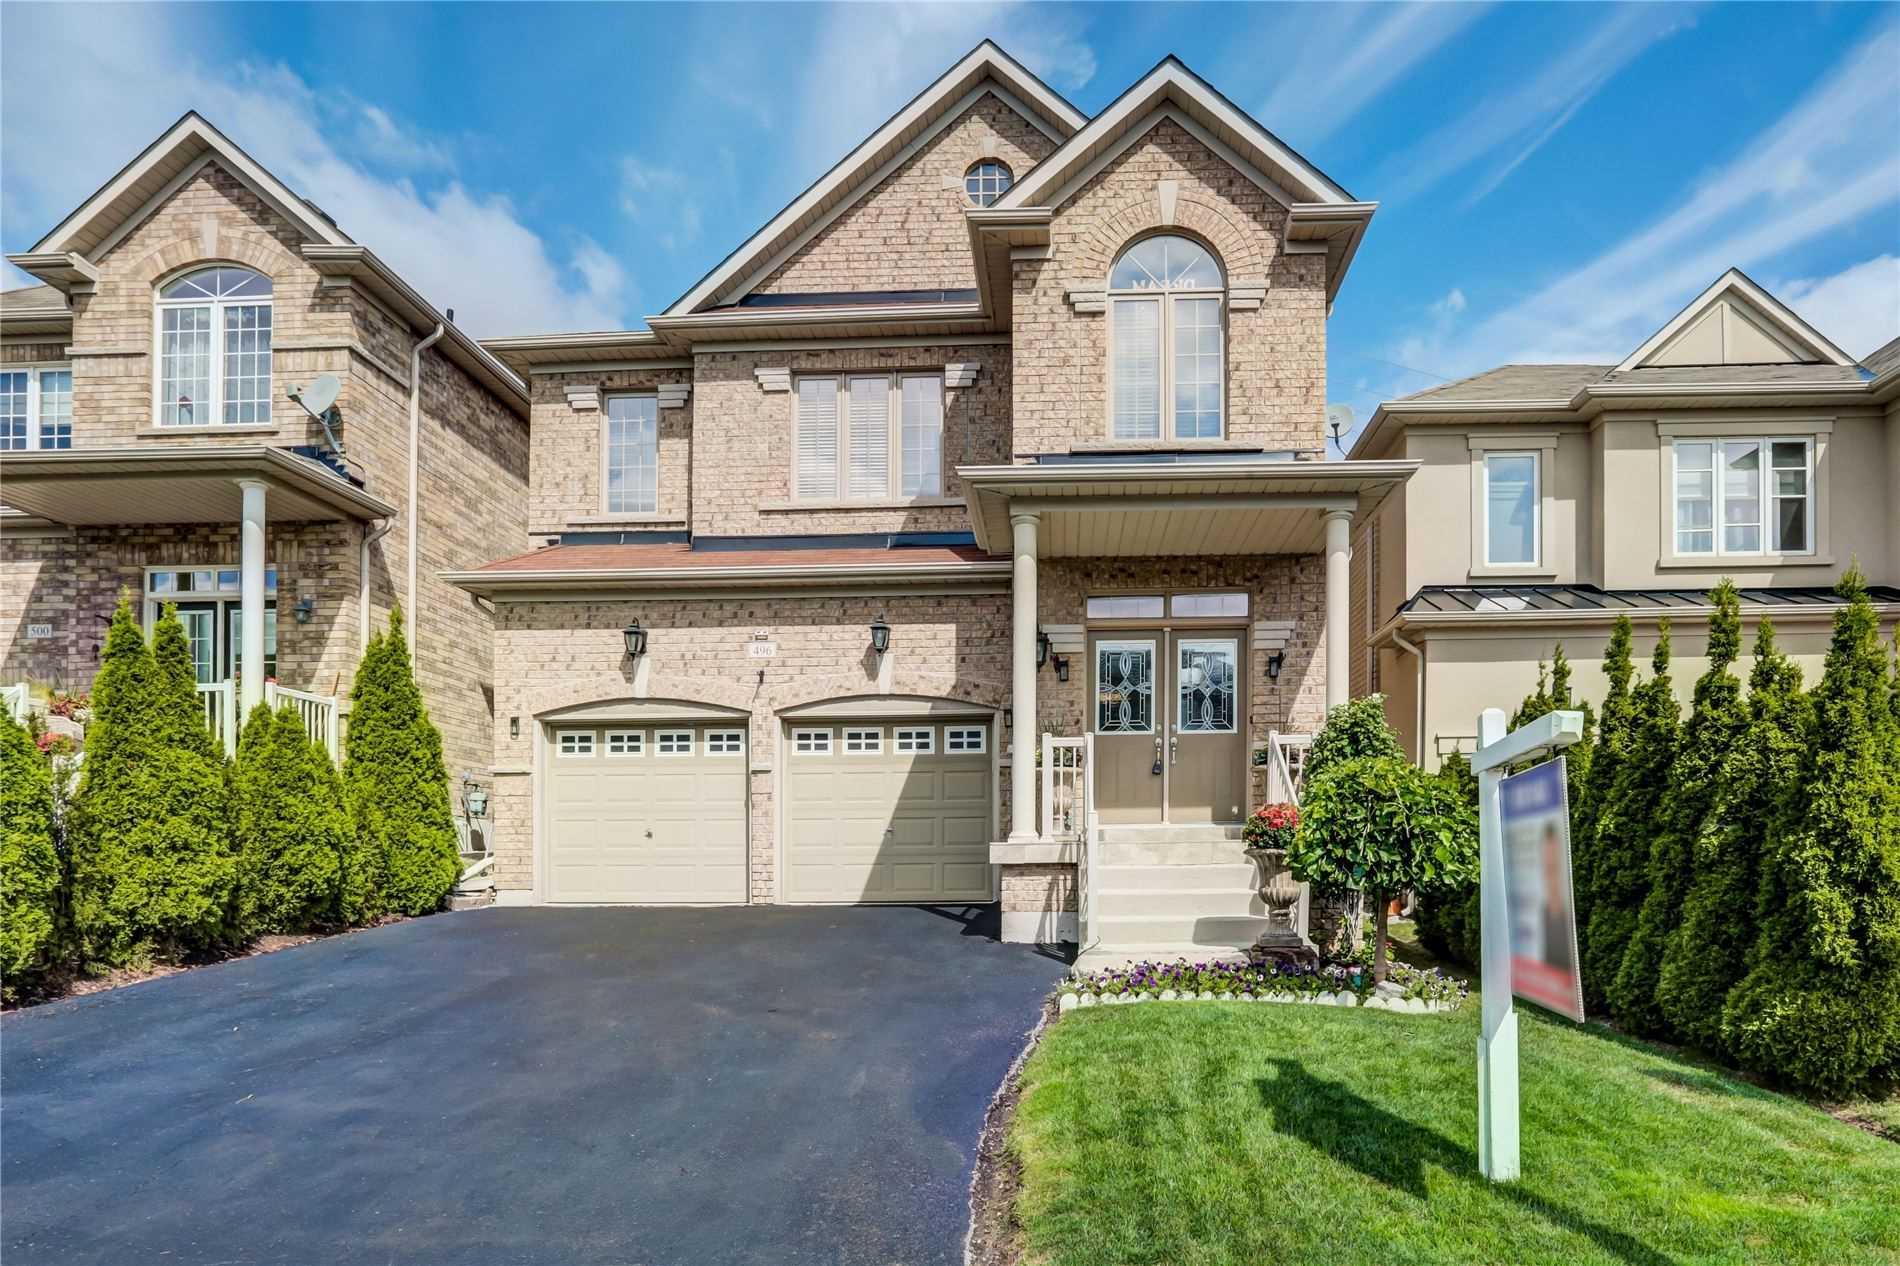 496 Foxcroft Blvd, Newmarket Ontario, Canada